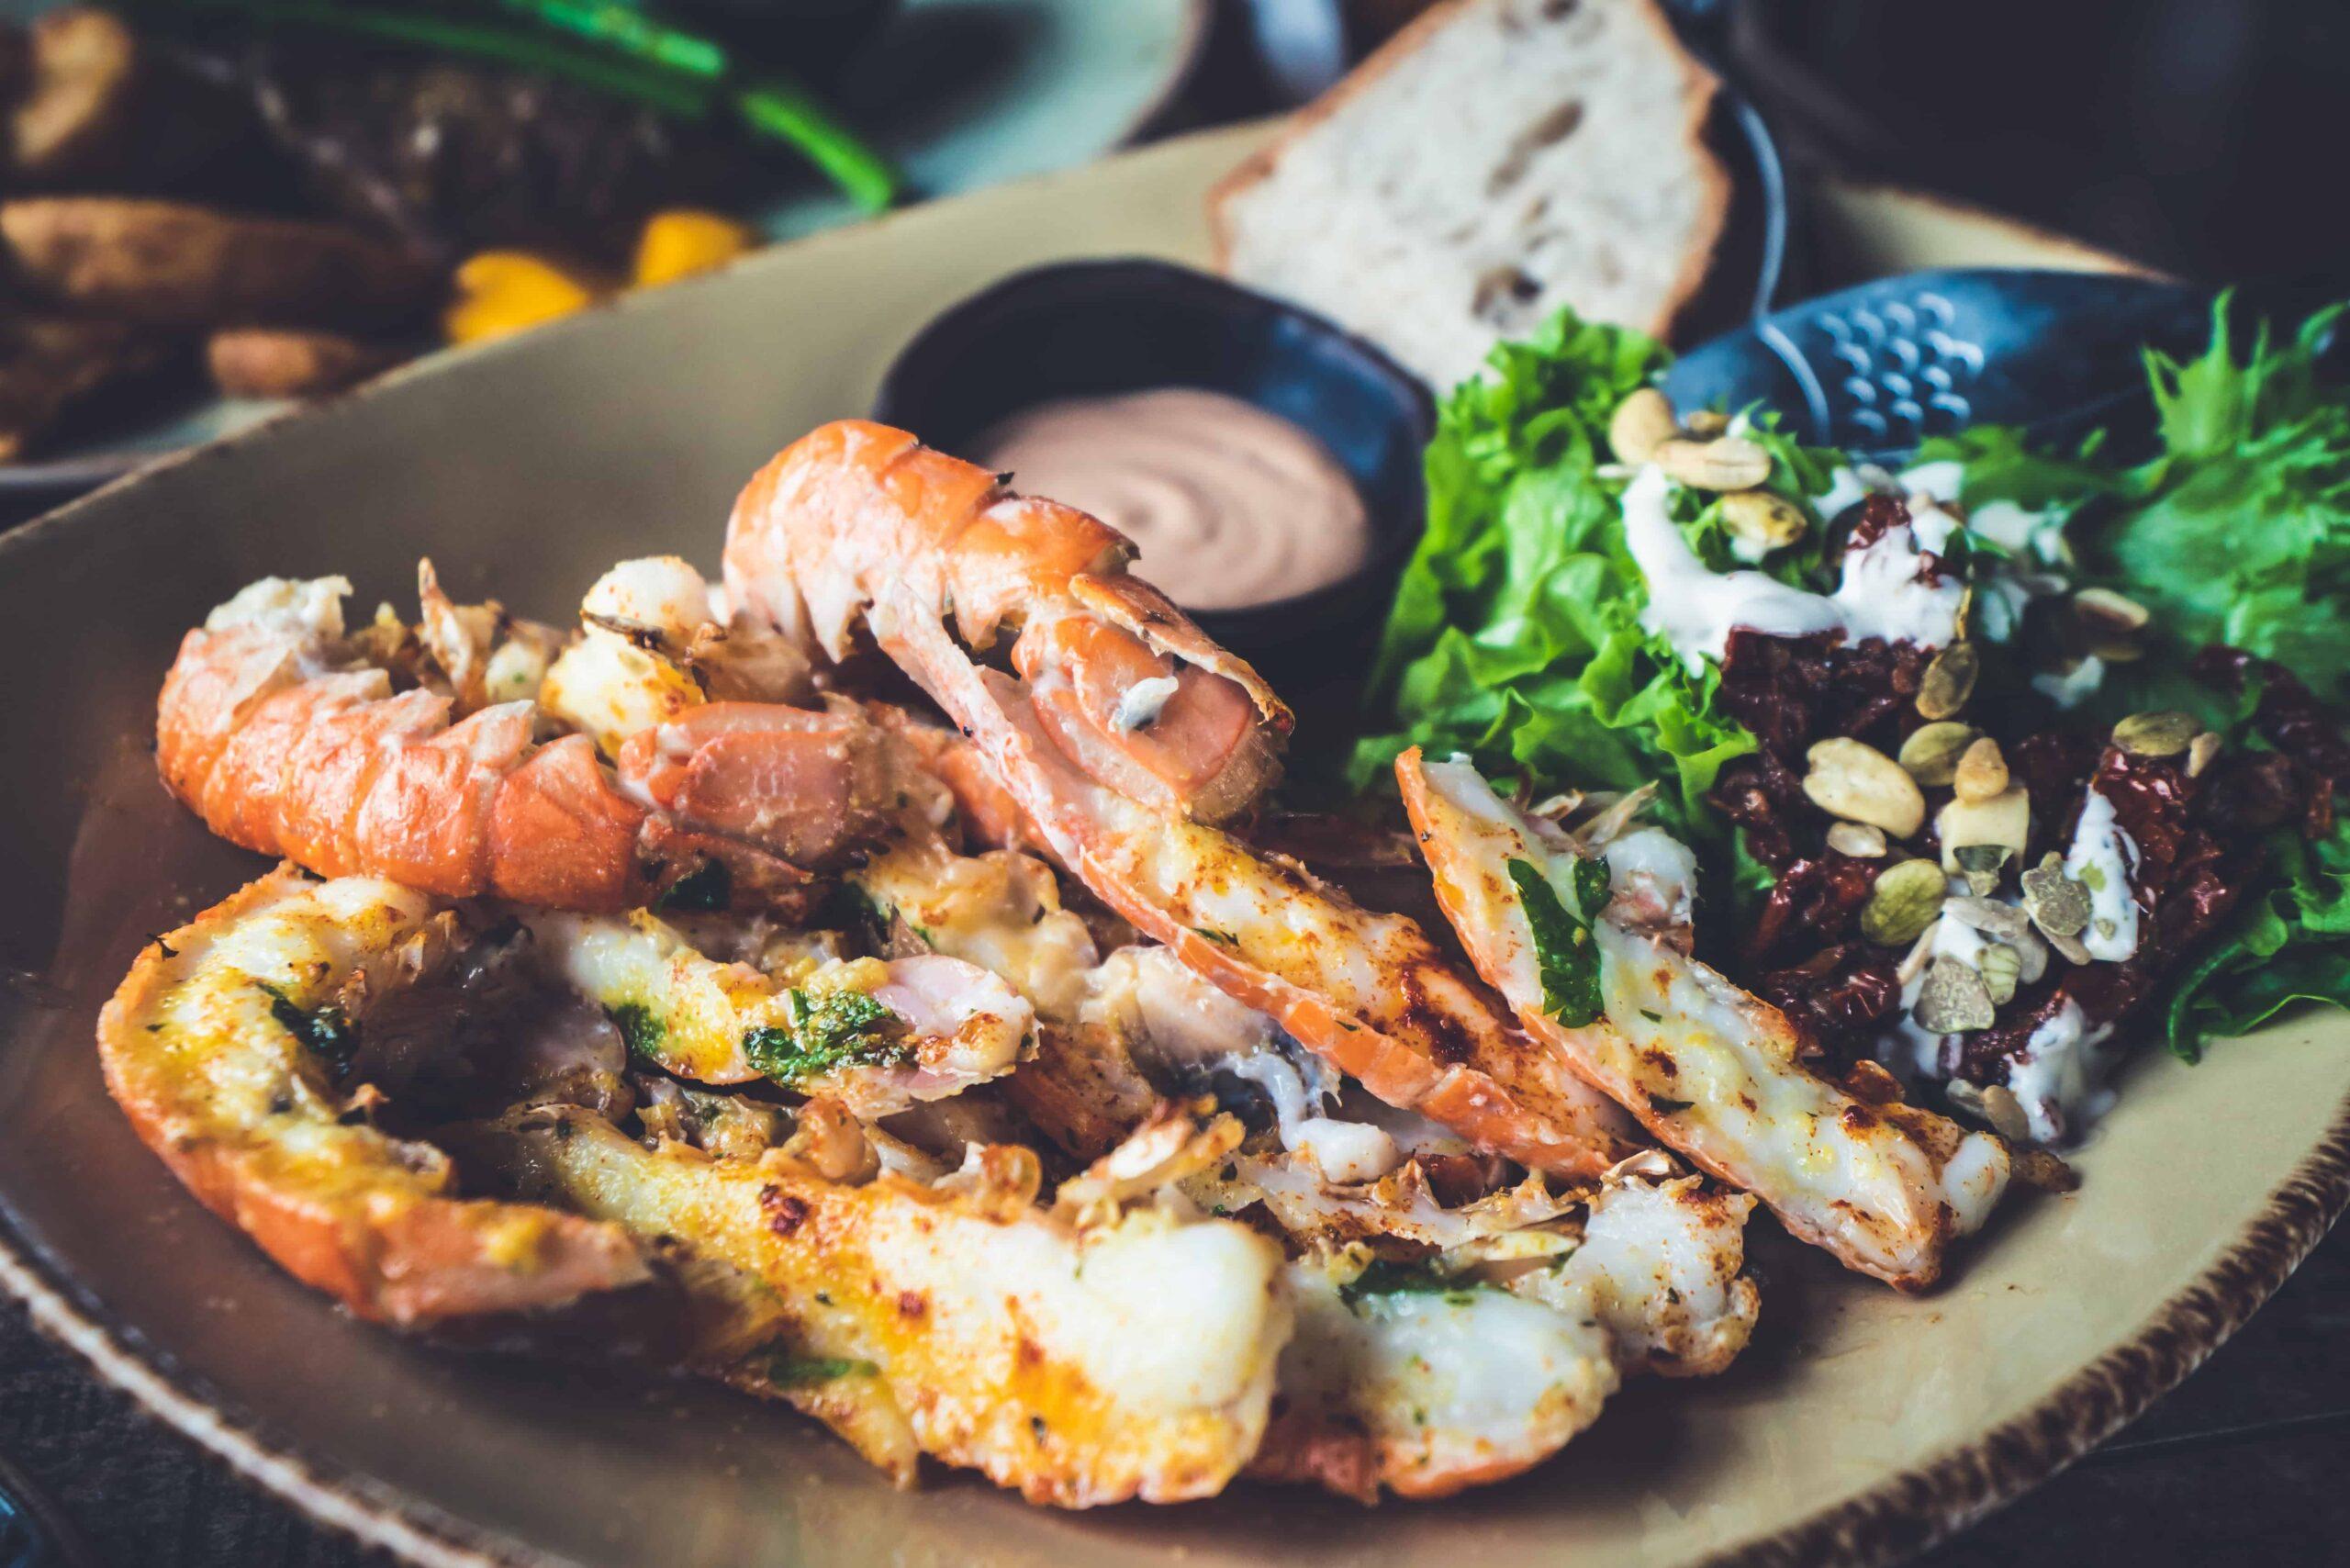 lobster - Icelandic Traditional Food